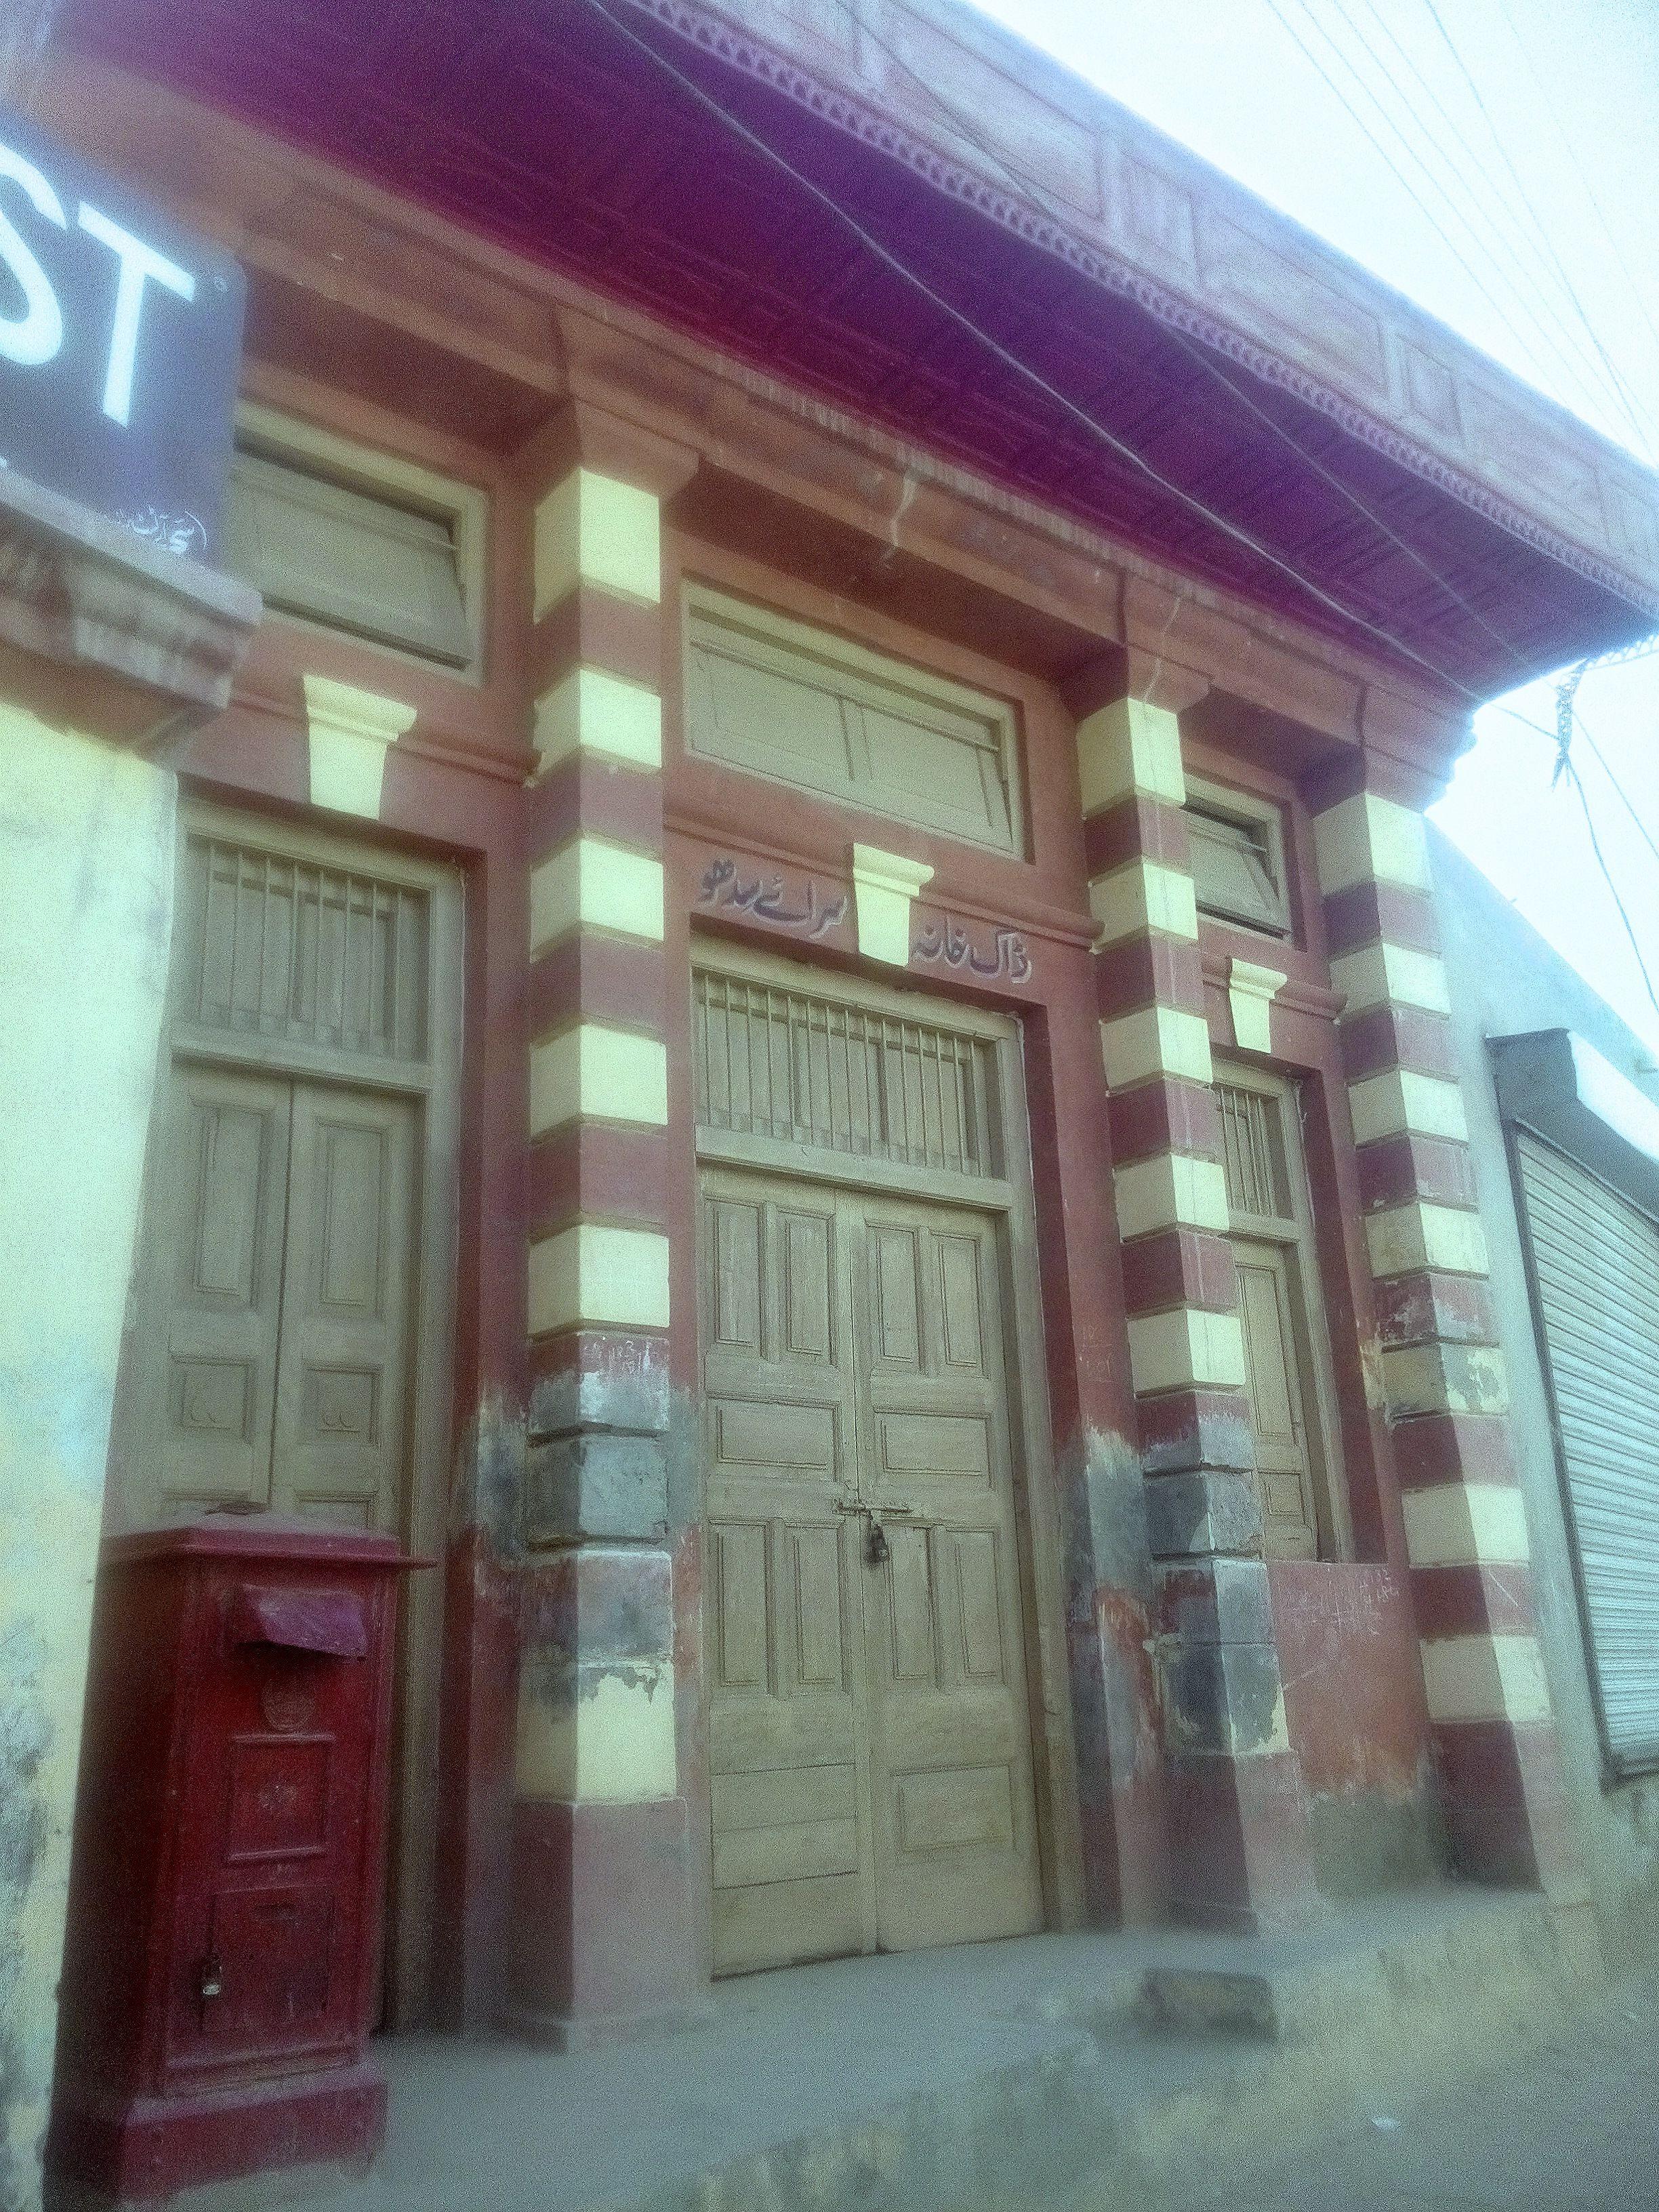 Old post office in Serai Siddhu